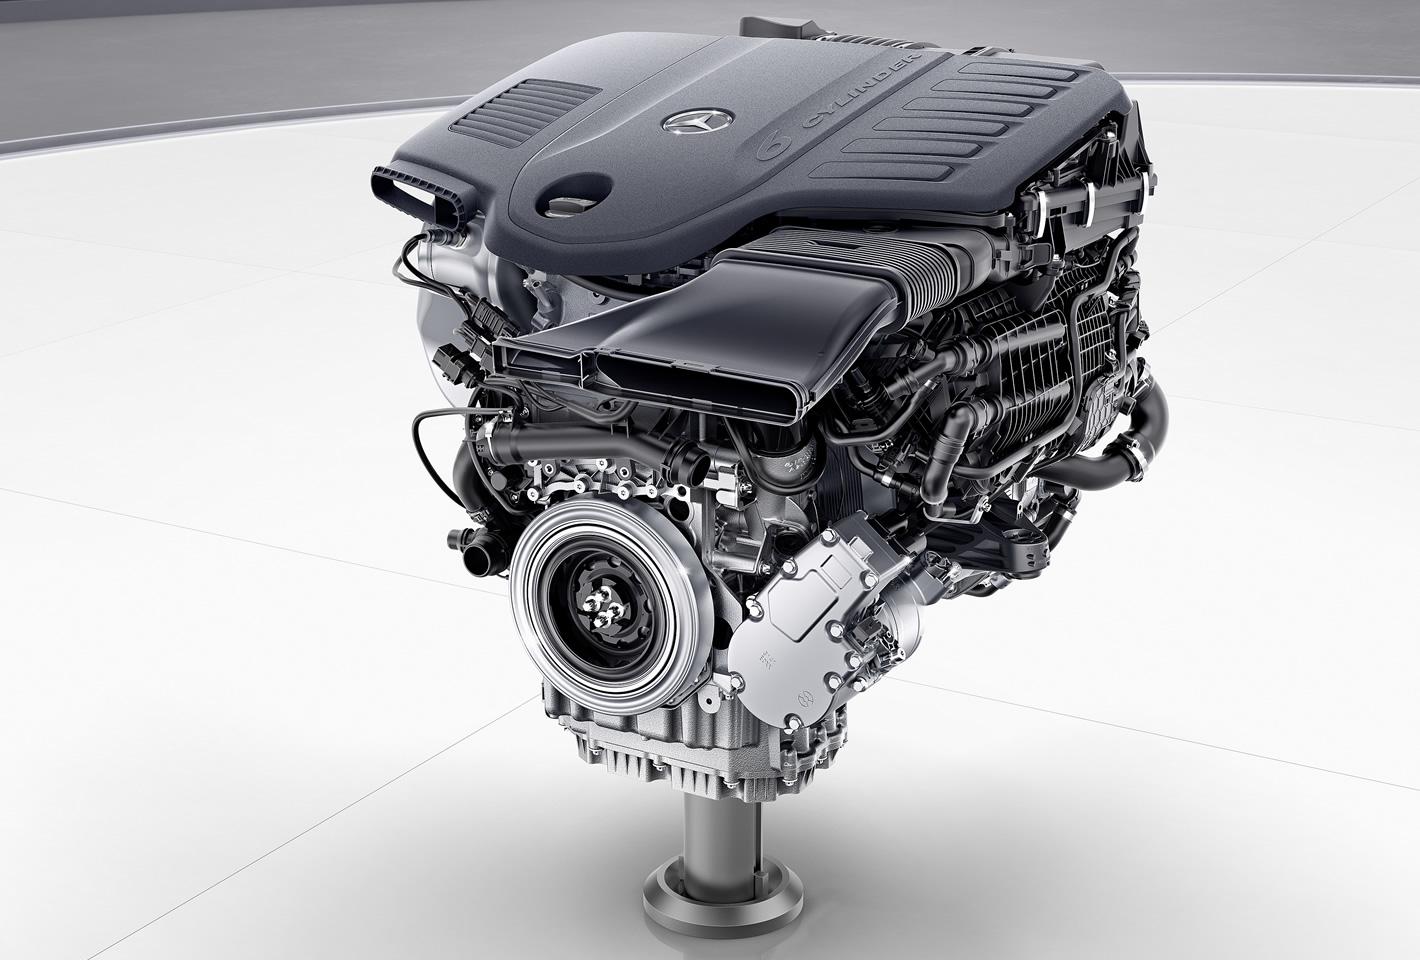 Mercedes-Benz GLE 450 4Matic EQ Boost - silnik z Mild Hybrid